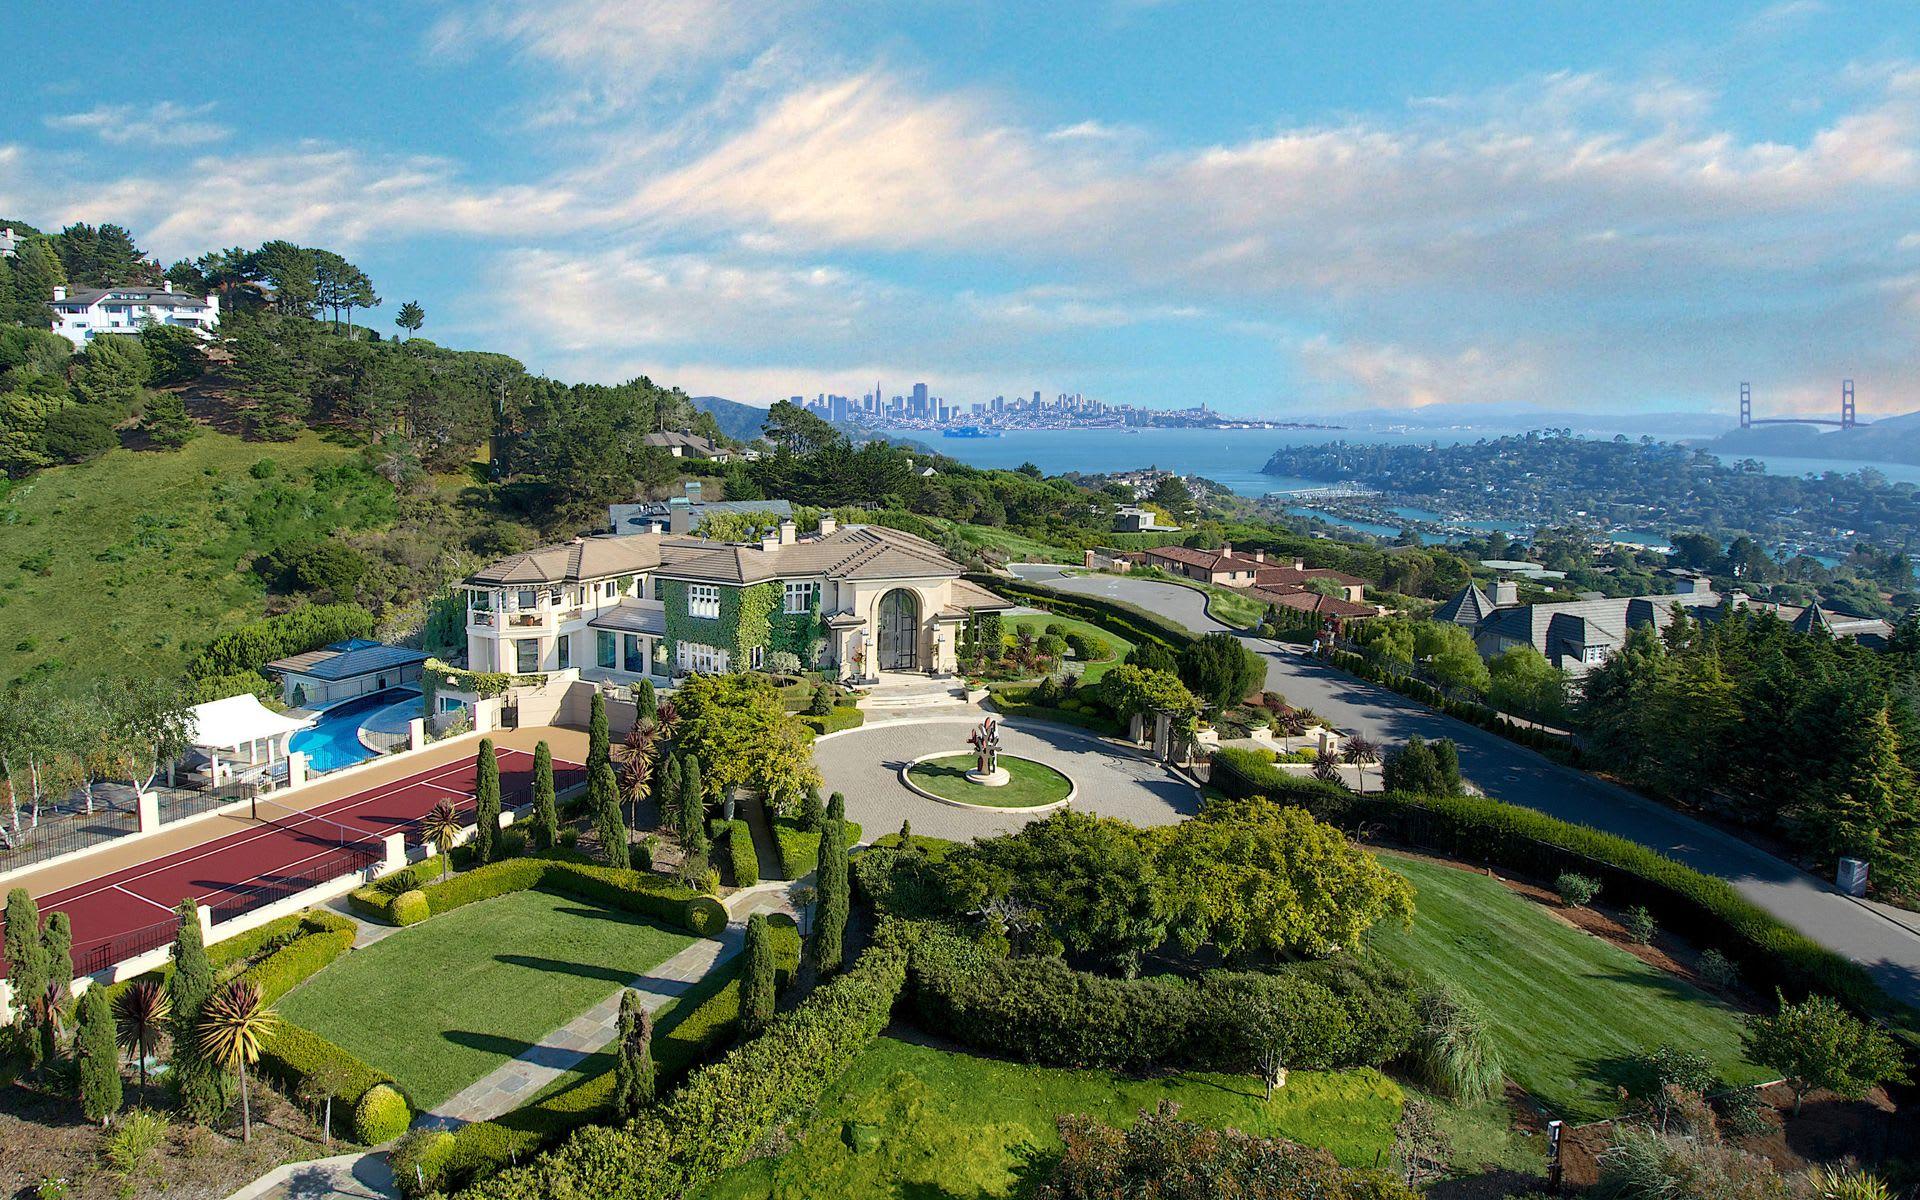 Bill Bullock and Lydia Sarkissian Break Luxury Home Sales Record in Marin